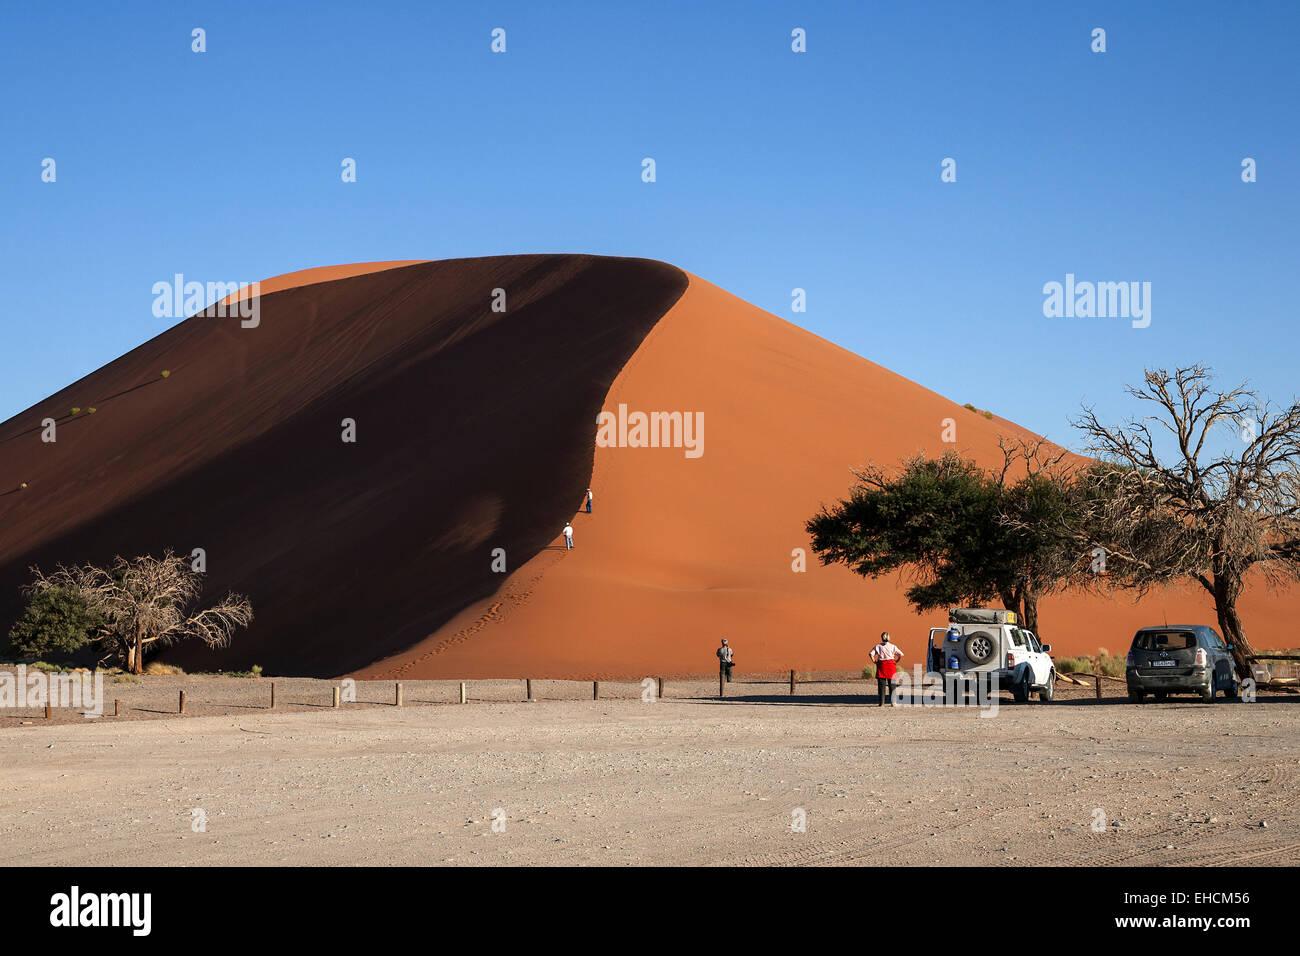 Parked vehicles in the parking lot in front of Dune 45, sand dunes, Sossusvlei, Namib Desert, Namib-Naukluft National - Stock Image